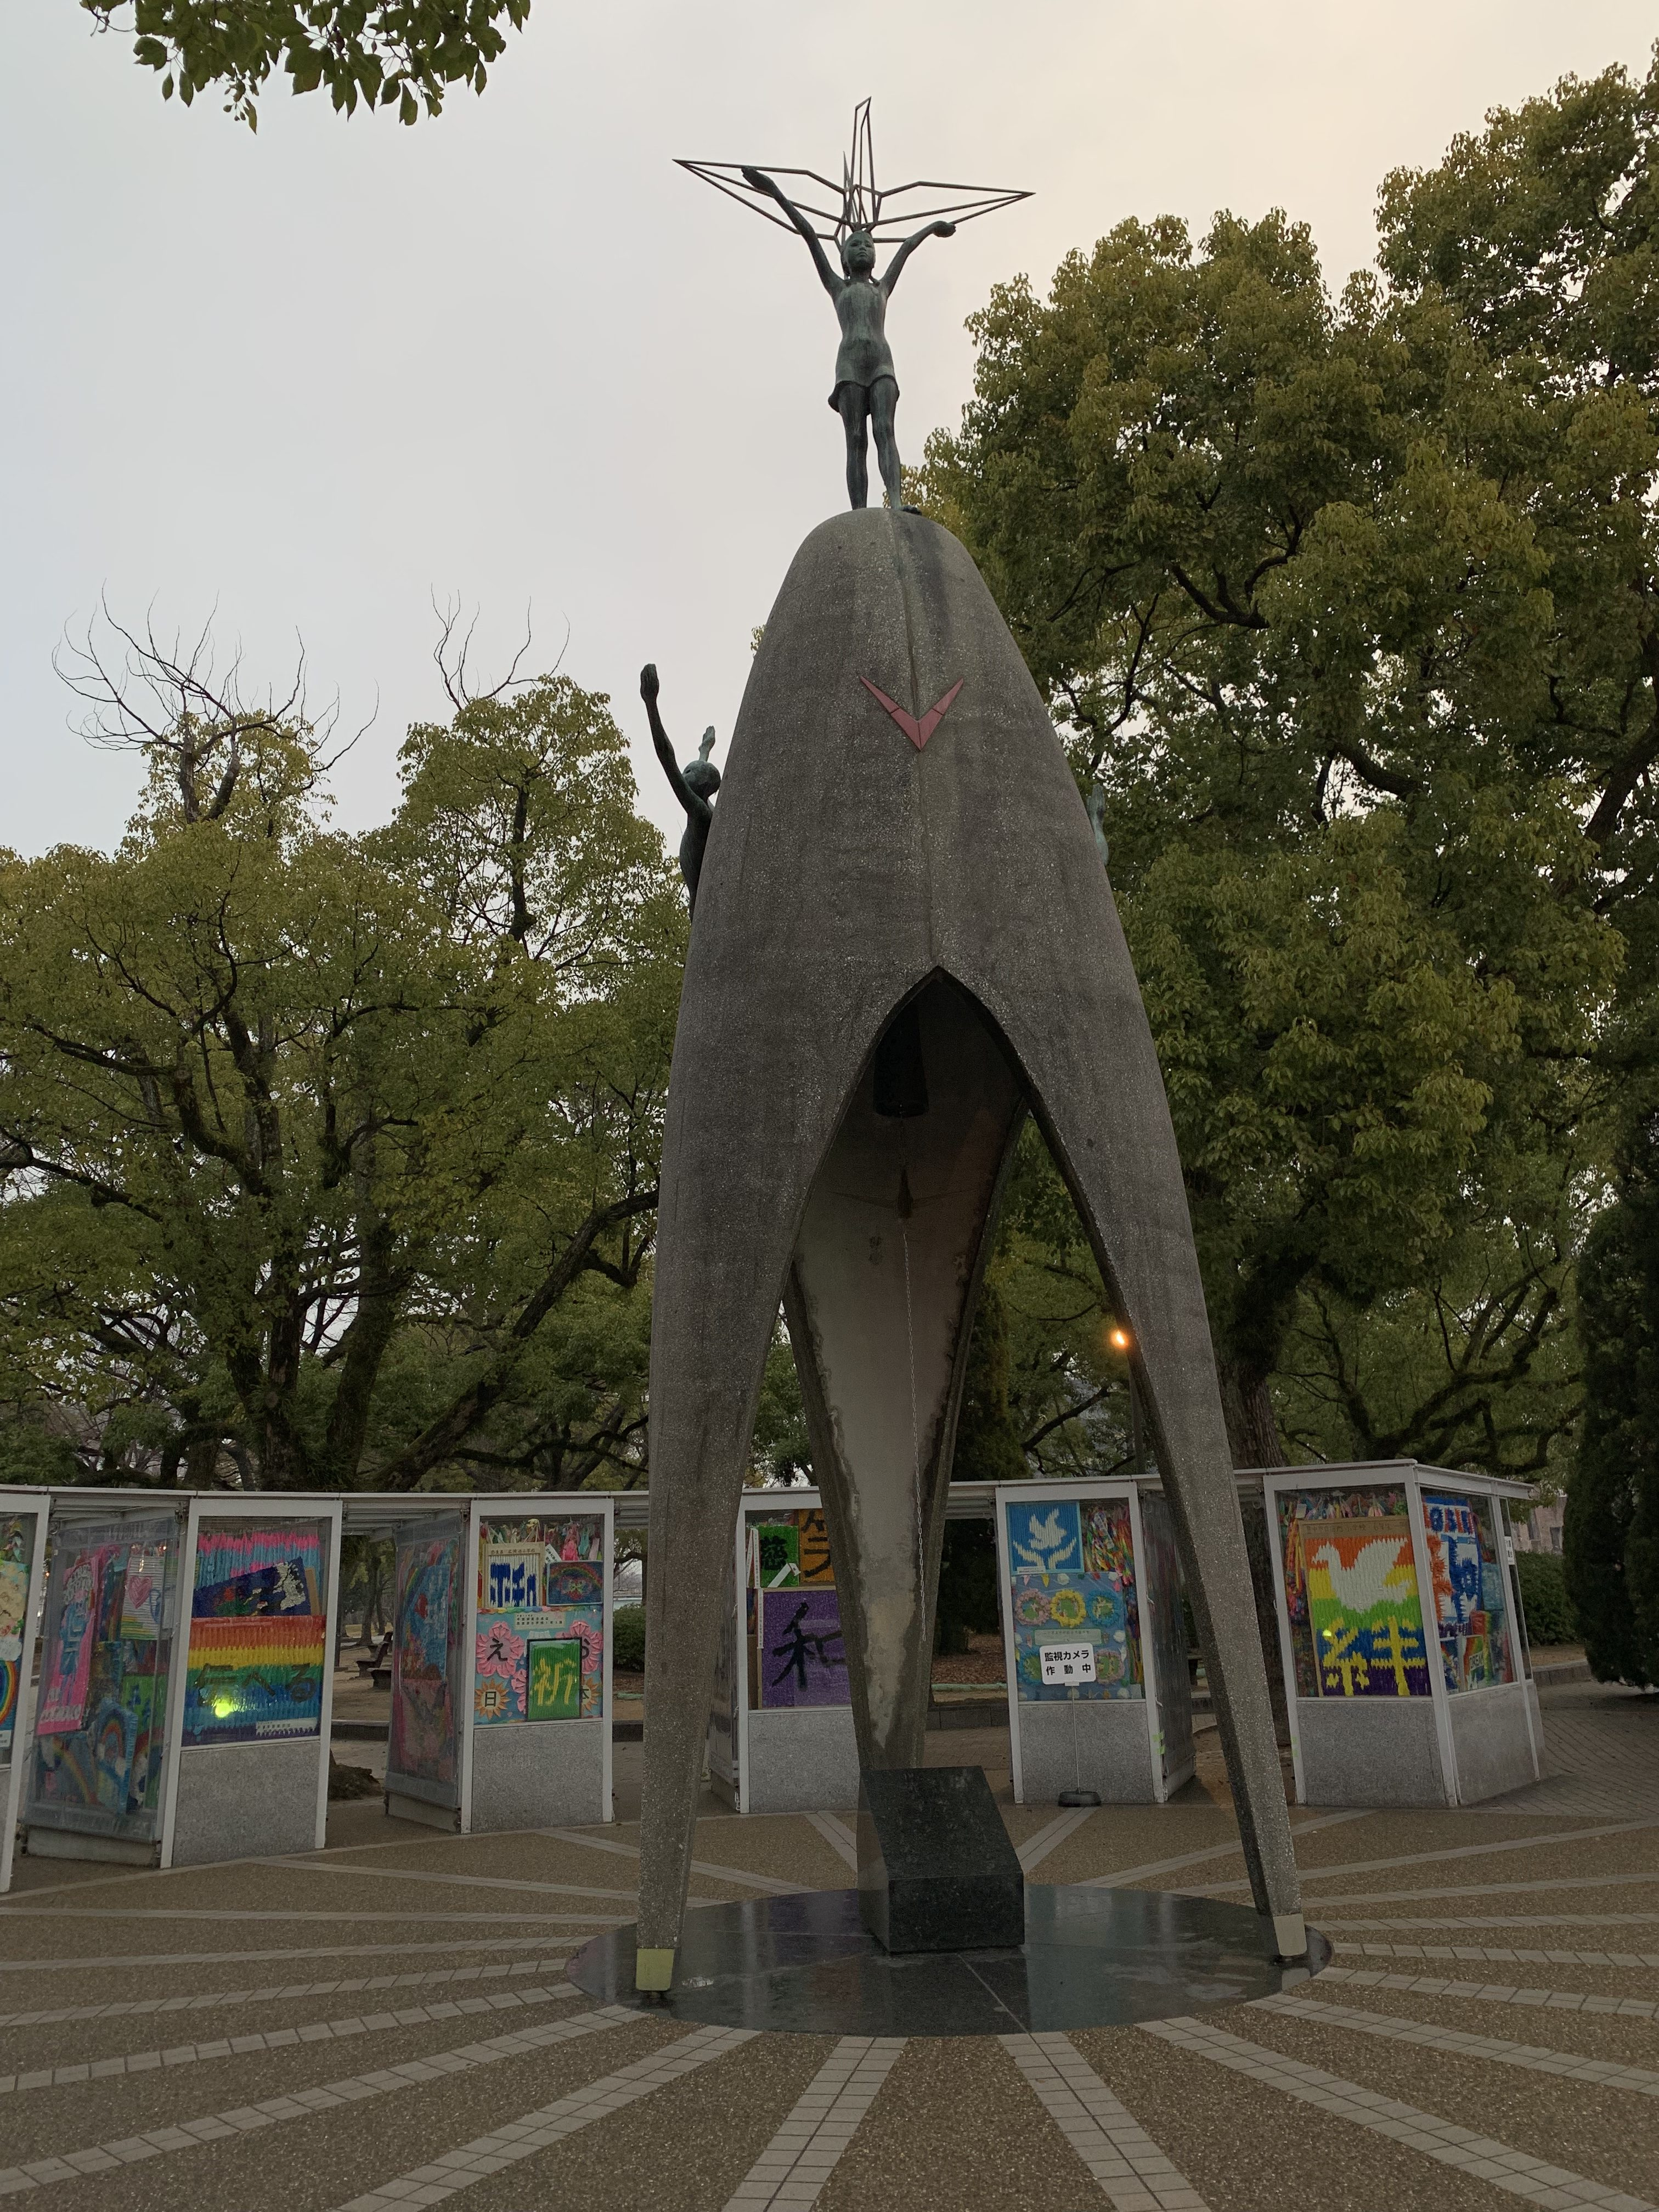 The Children's Memorial in Peace Park